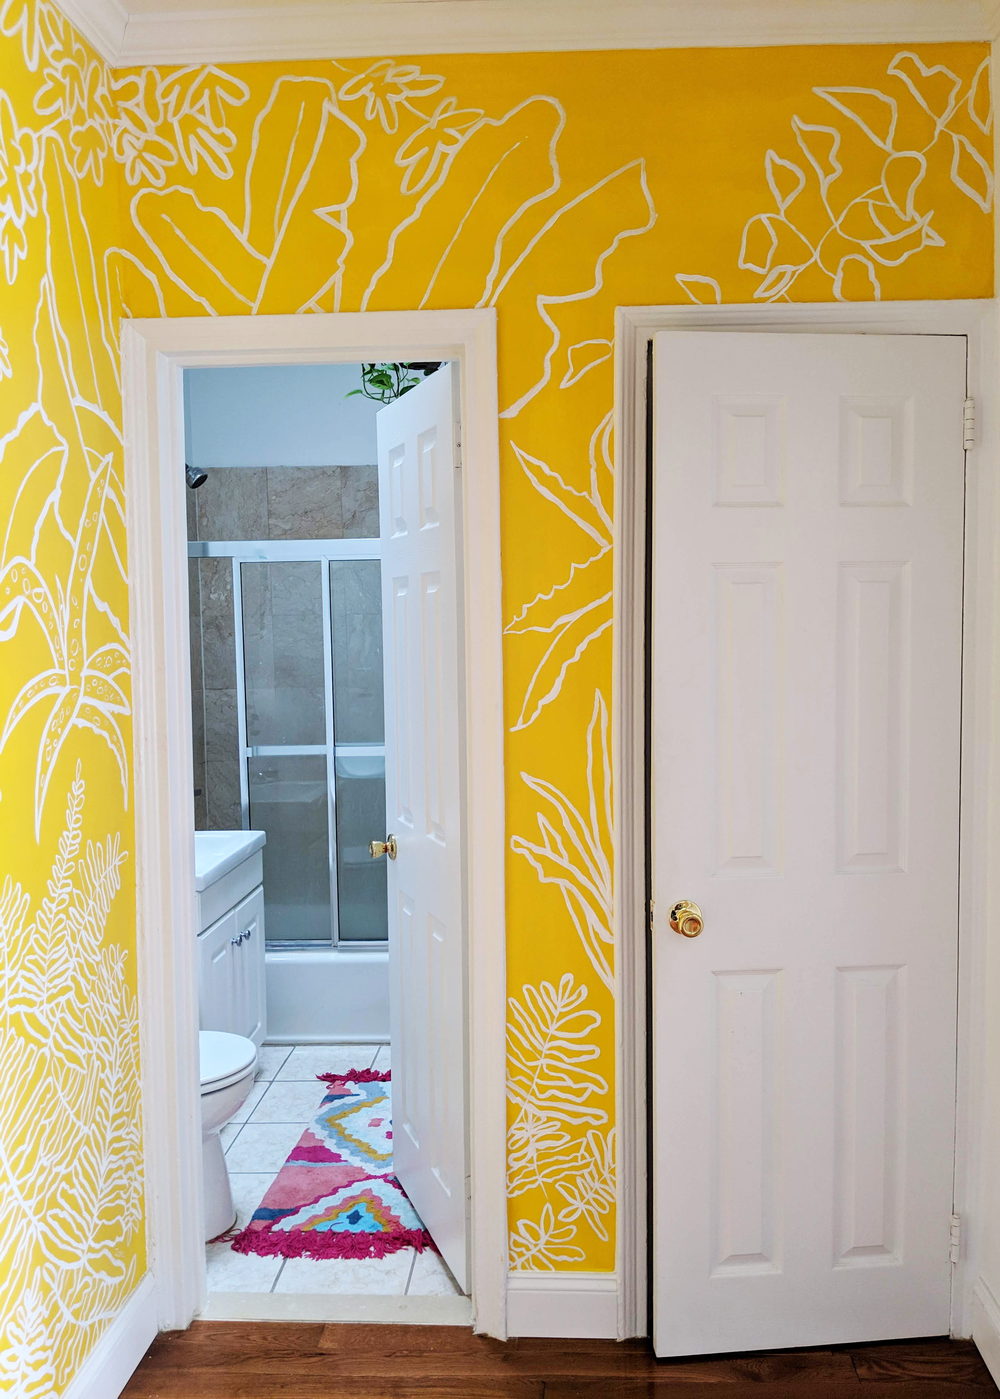 03 2019_Yellow Mural UES_05.png